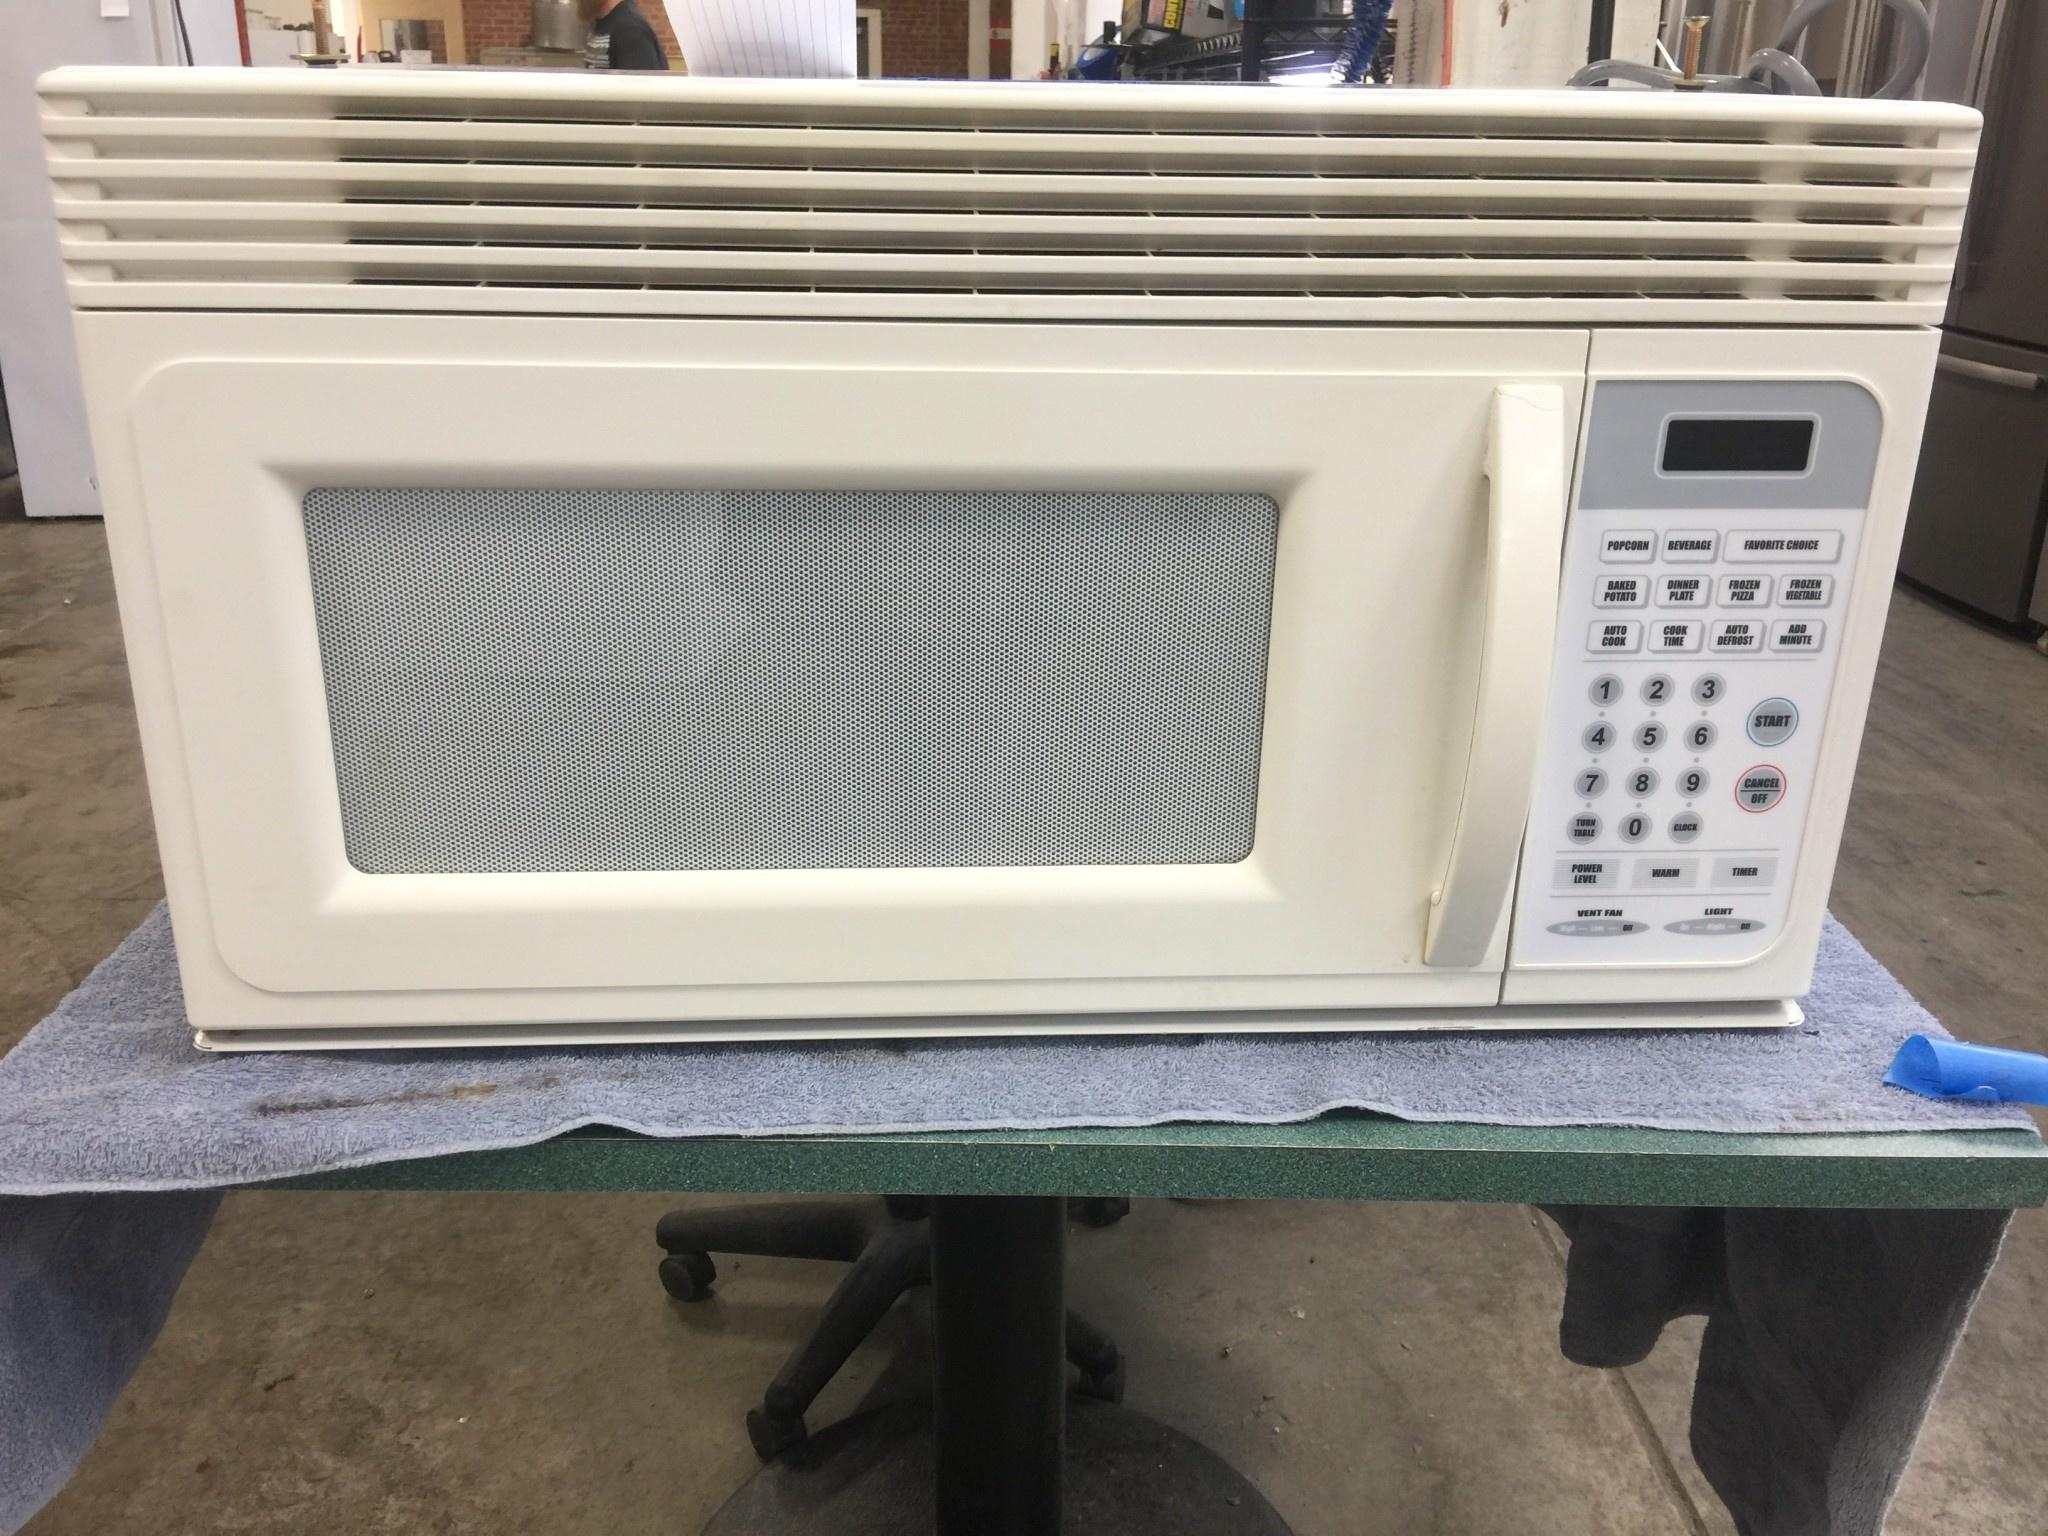 Magic Chef Magic Chef Microwave Discount City Appliance